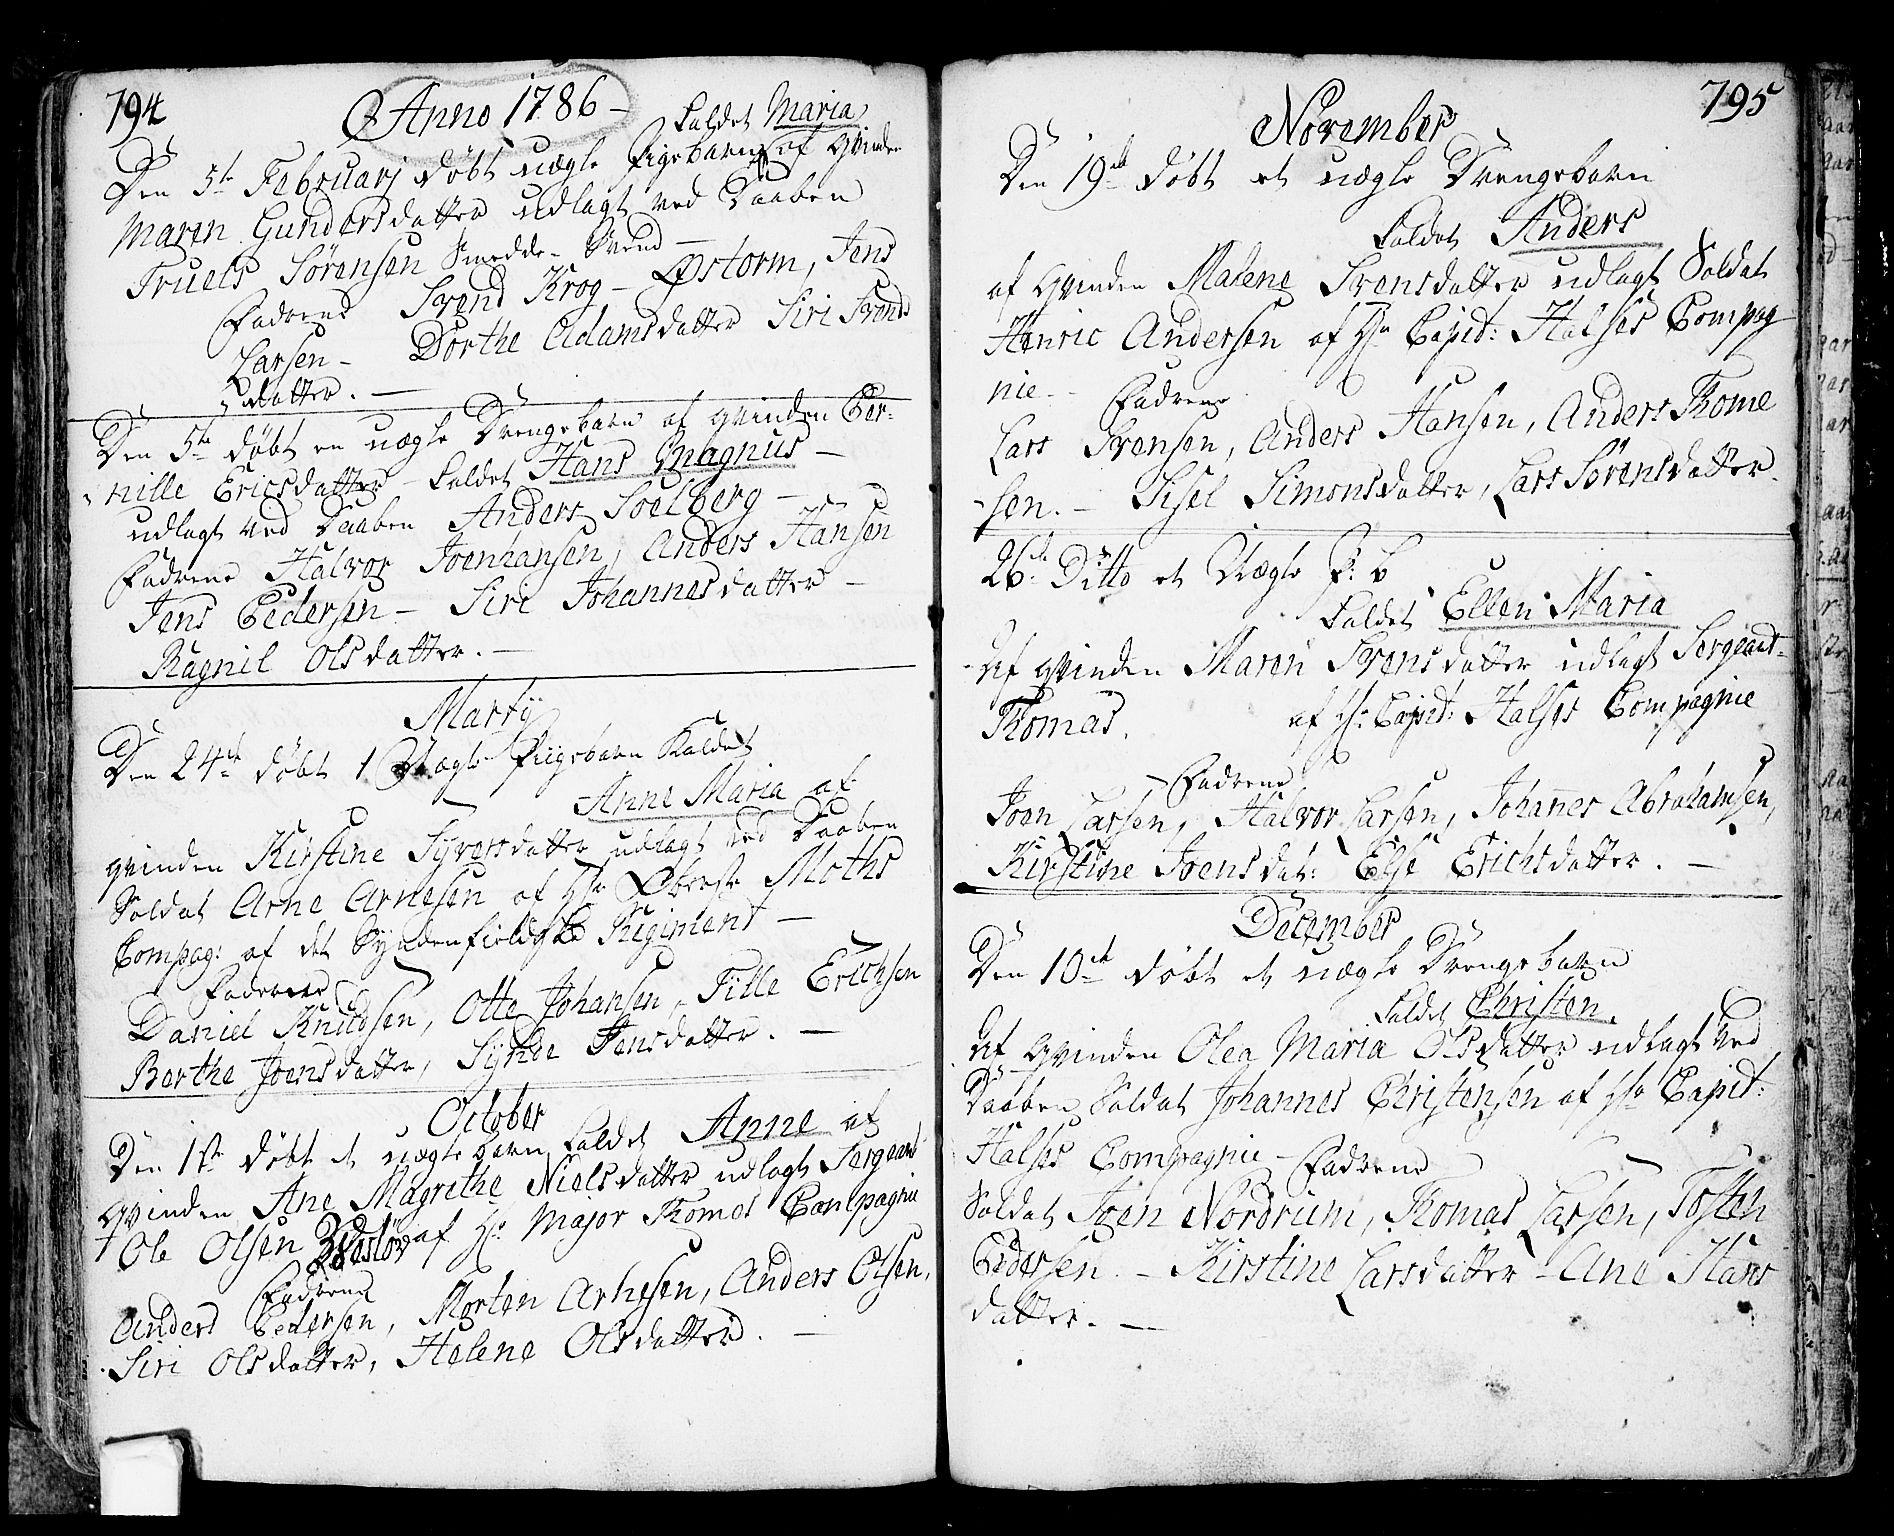 SAO, Fredrikstad prestekontor Kirkebøker, F/Fa/L0002: Ministerialbok nr. 2, 1750-1804, s. 794-795